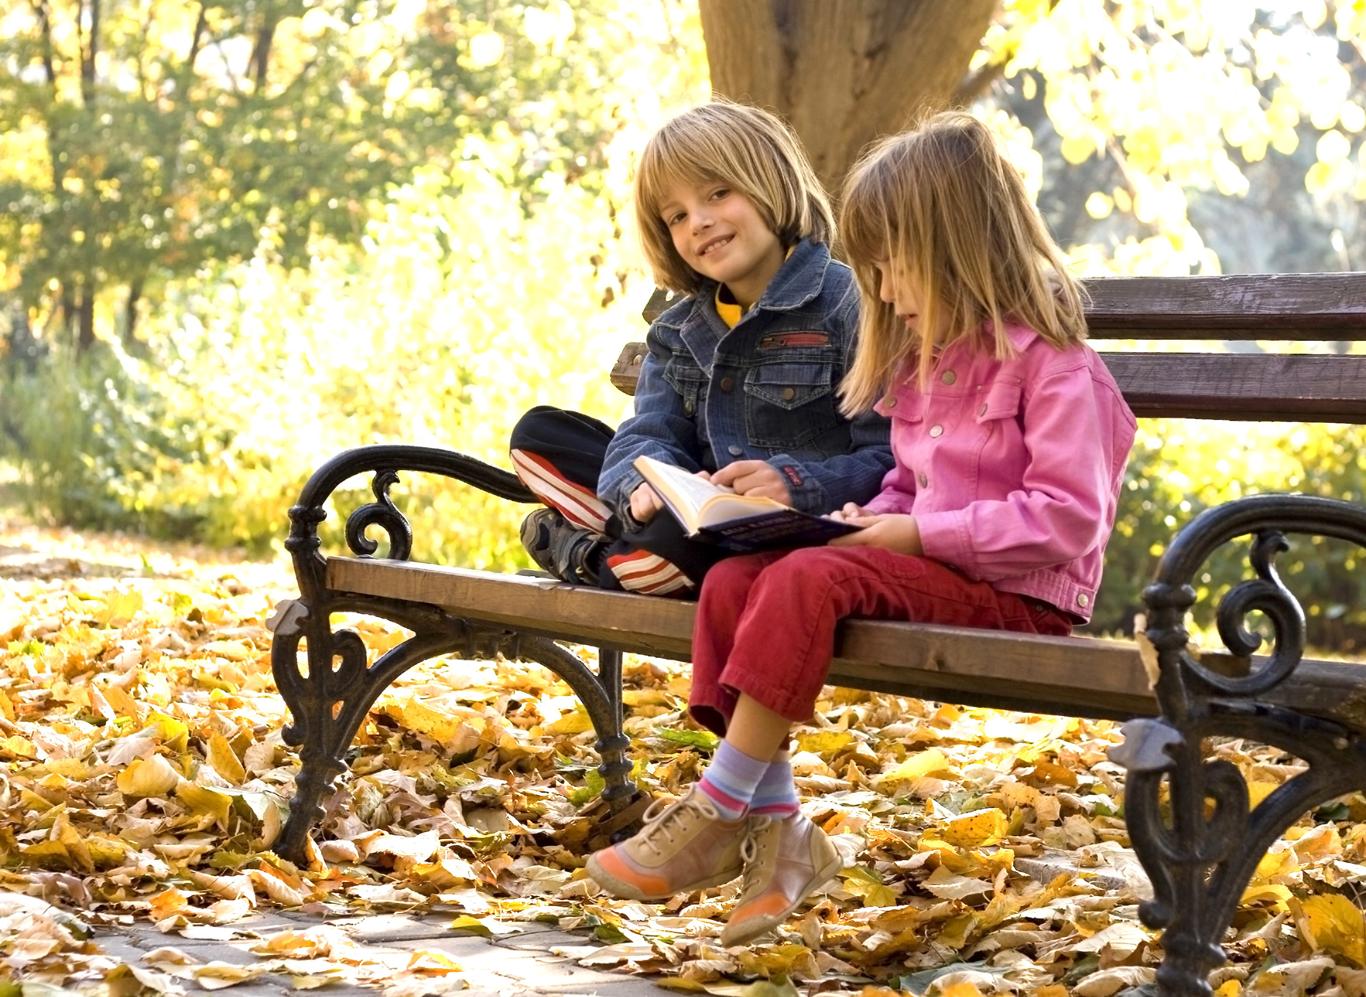 Fall-Kids-1366-1017.png